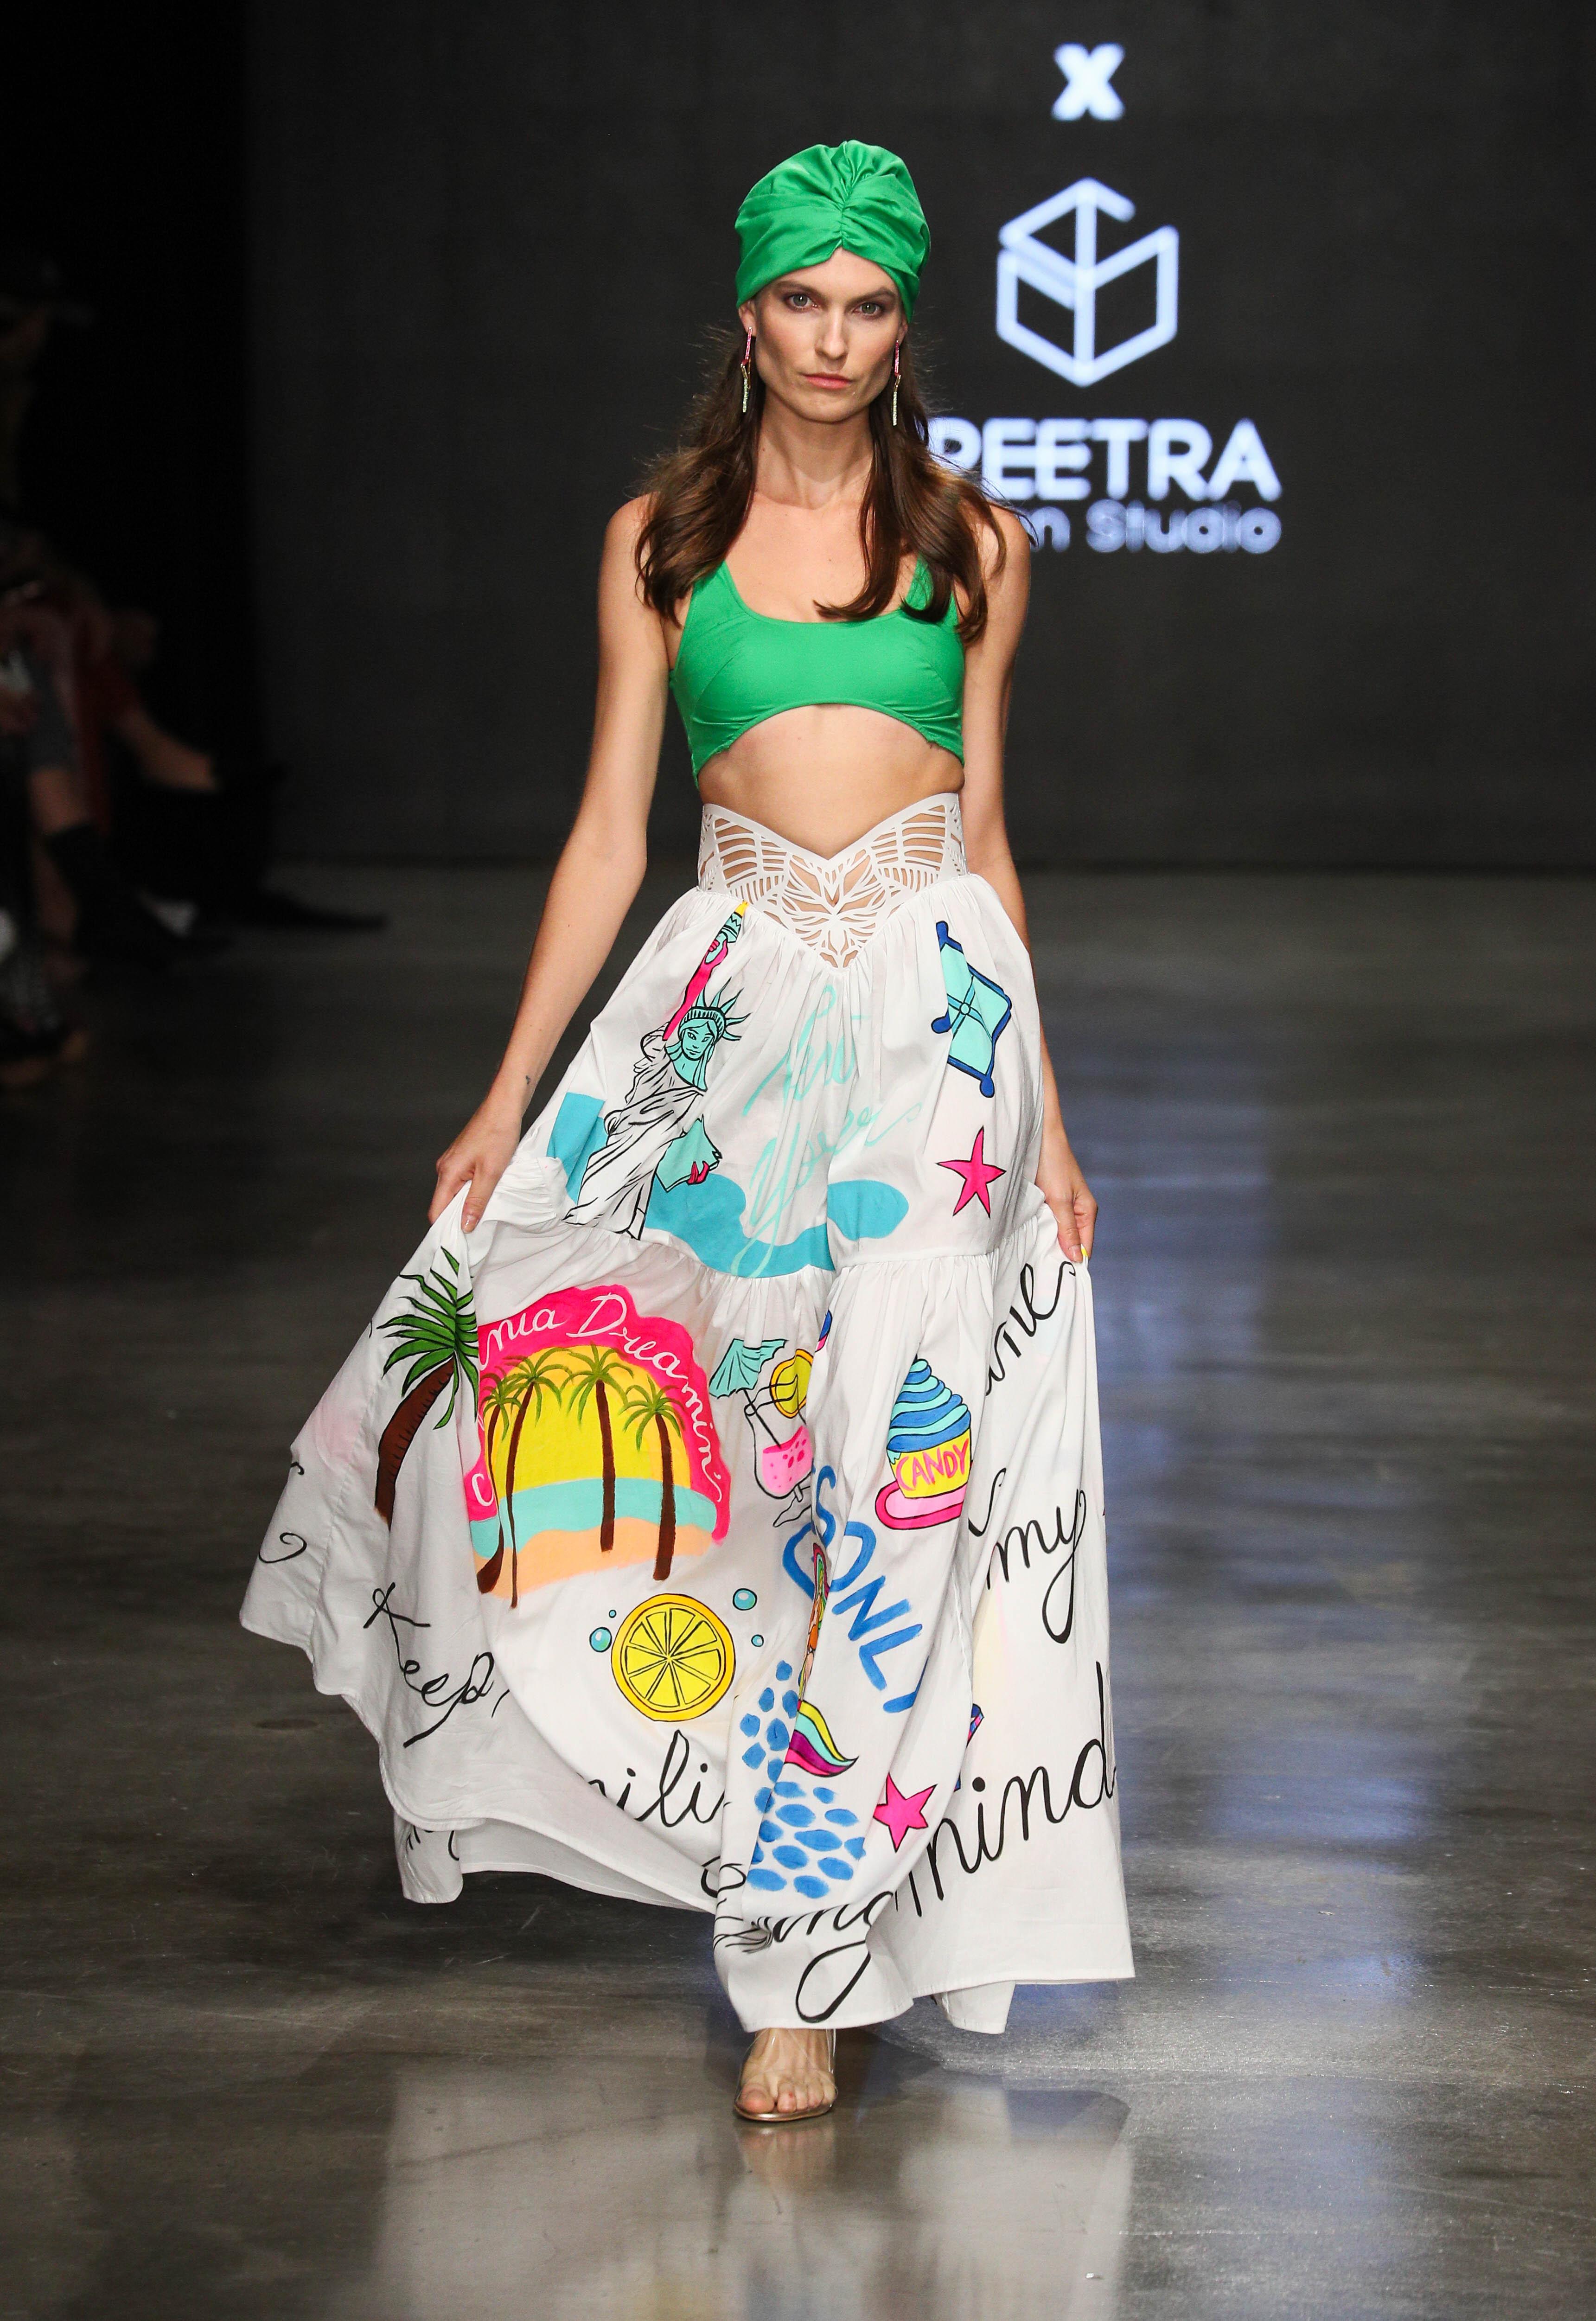 By Gee x Speetra Sustainable Fashion EcoMogul Magazine 3